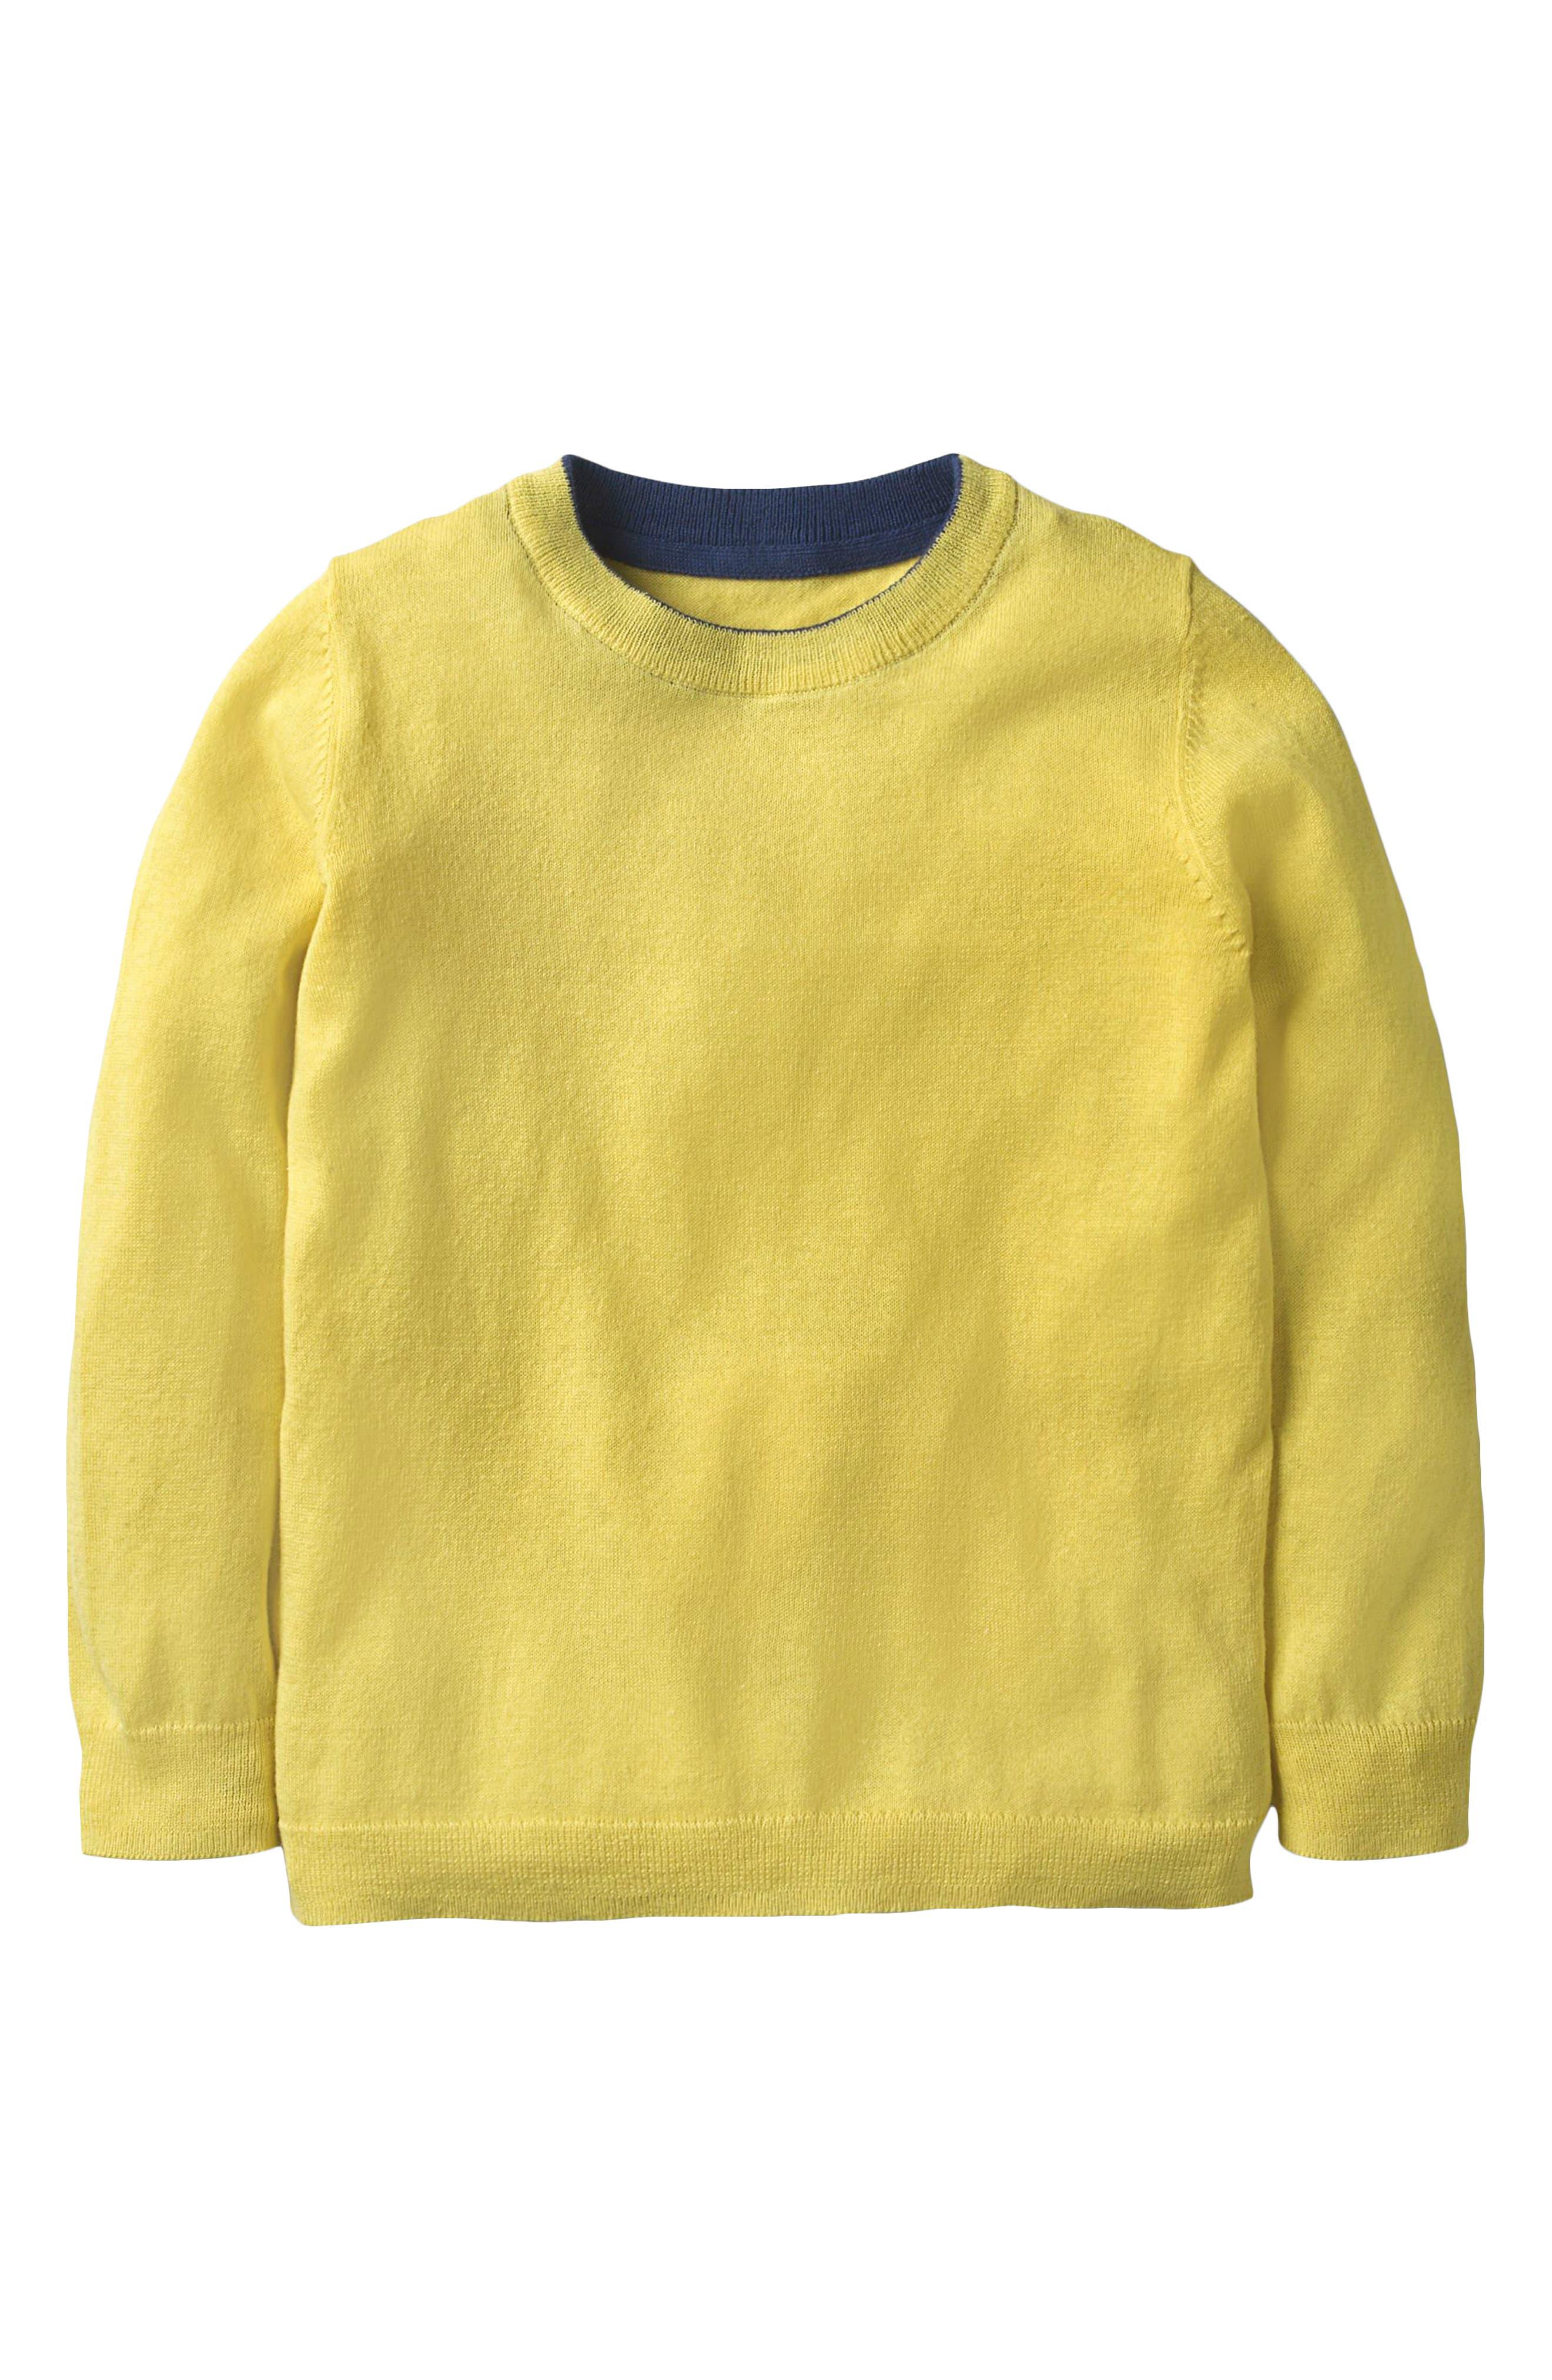 Cotton & Cashmere Sweater,                         Main,                         color, 704